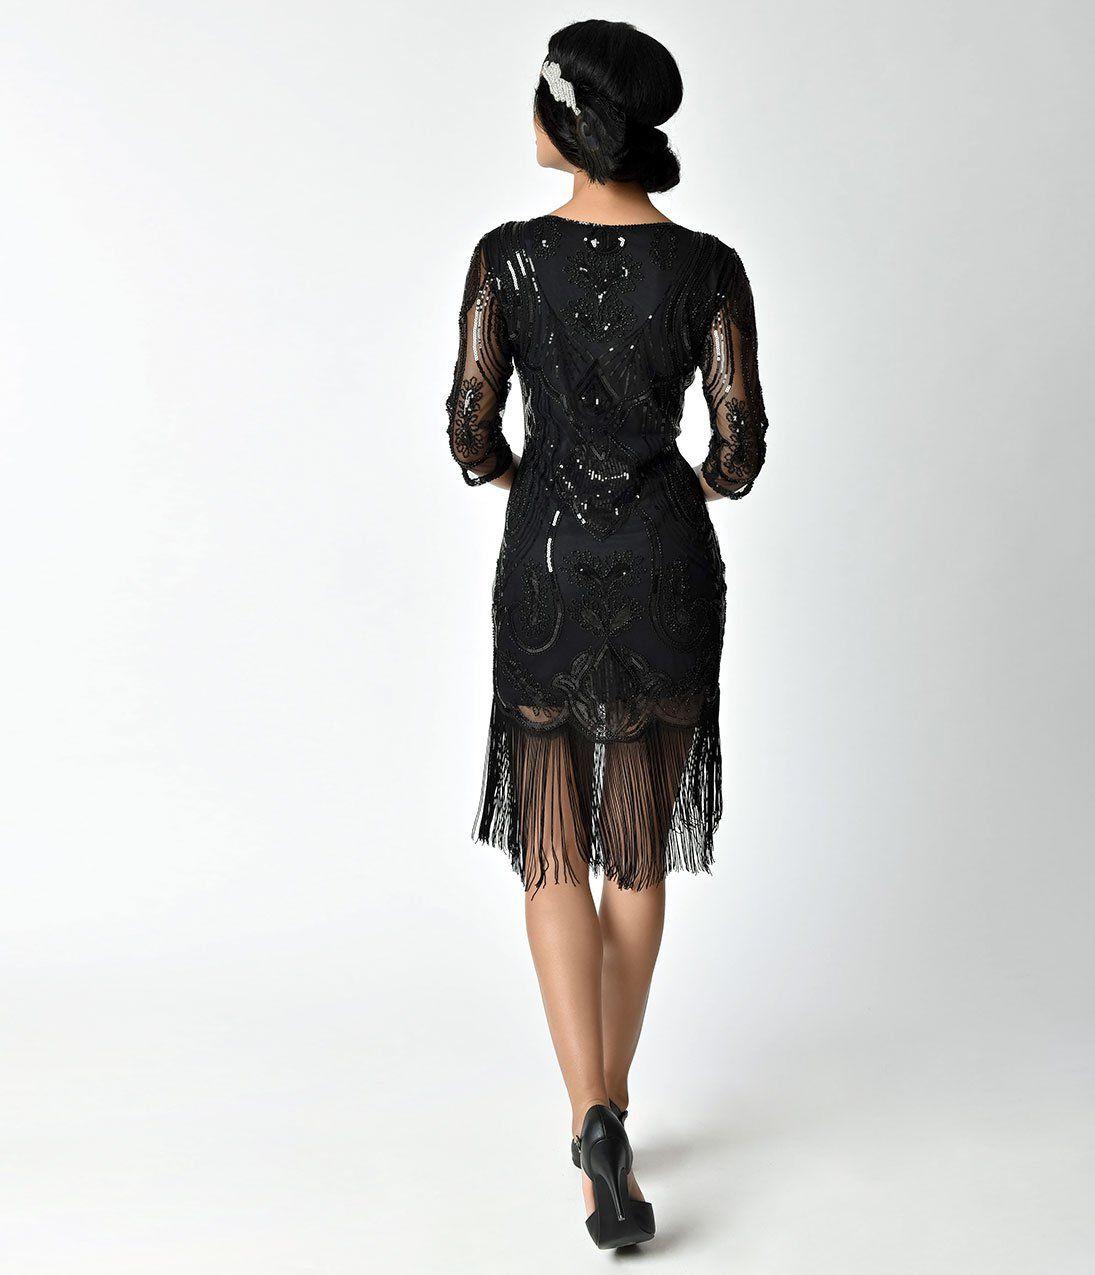 Unique Vintage 1920s Black Sequin Fringe Del Mar Flapper Dress Black Flapper Dress 1920s Fashion Women Fringe Flapper Dress [ 1275 x 1095 Pixel ]